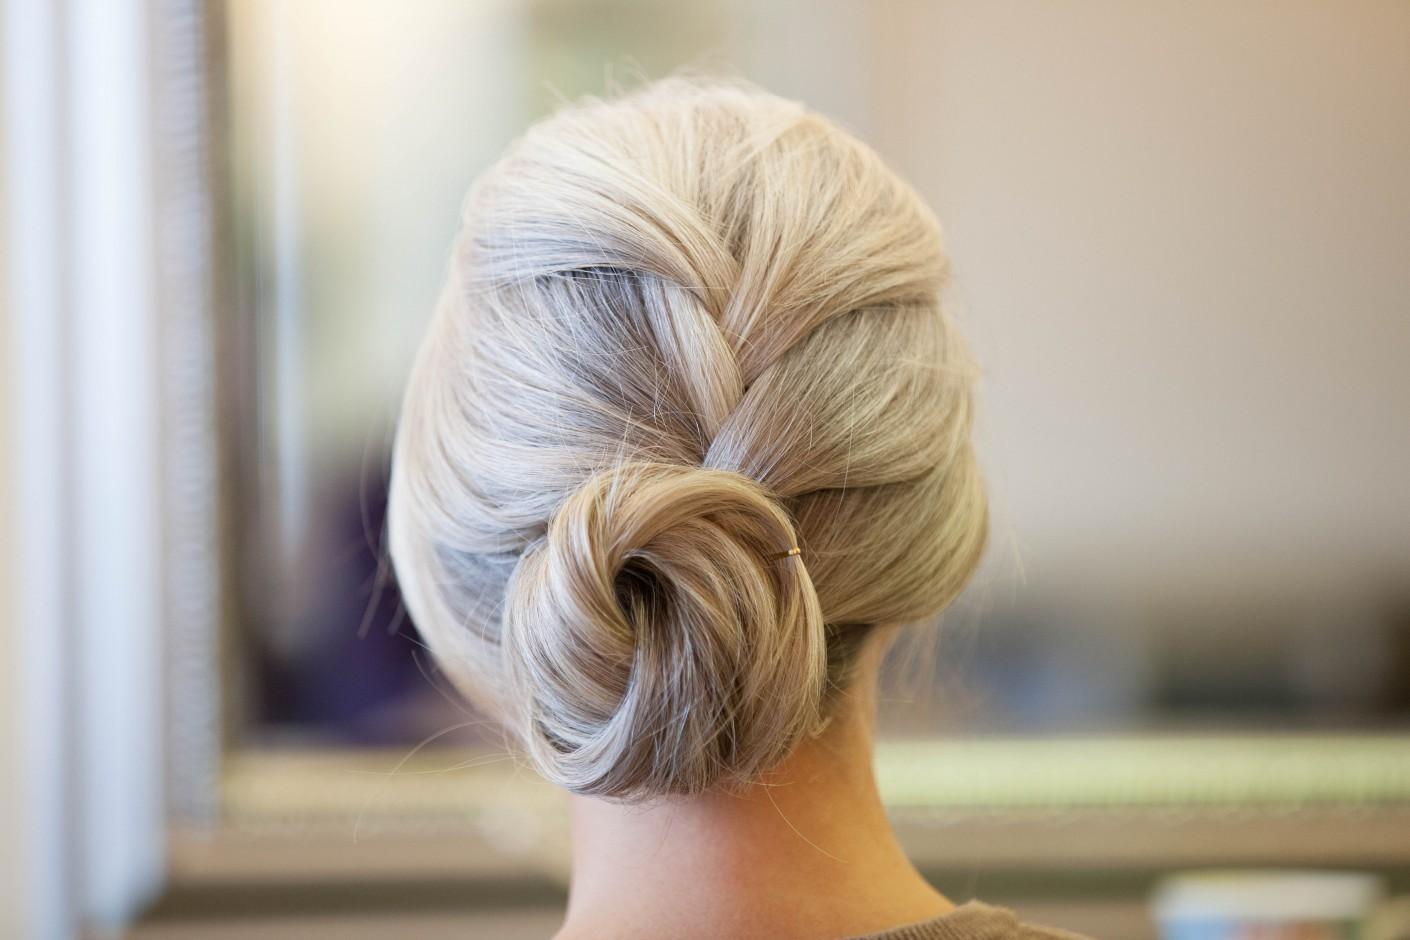 Hair how to's 3: Slouchy low braid bun